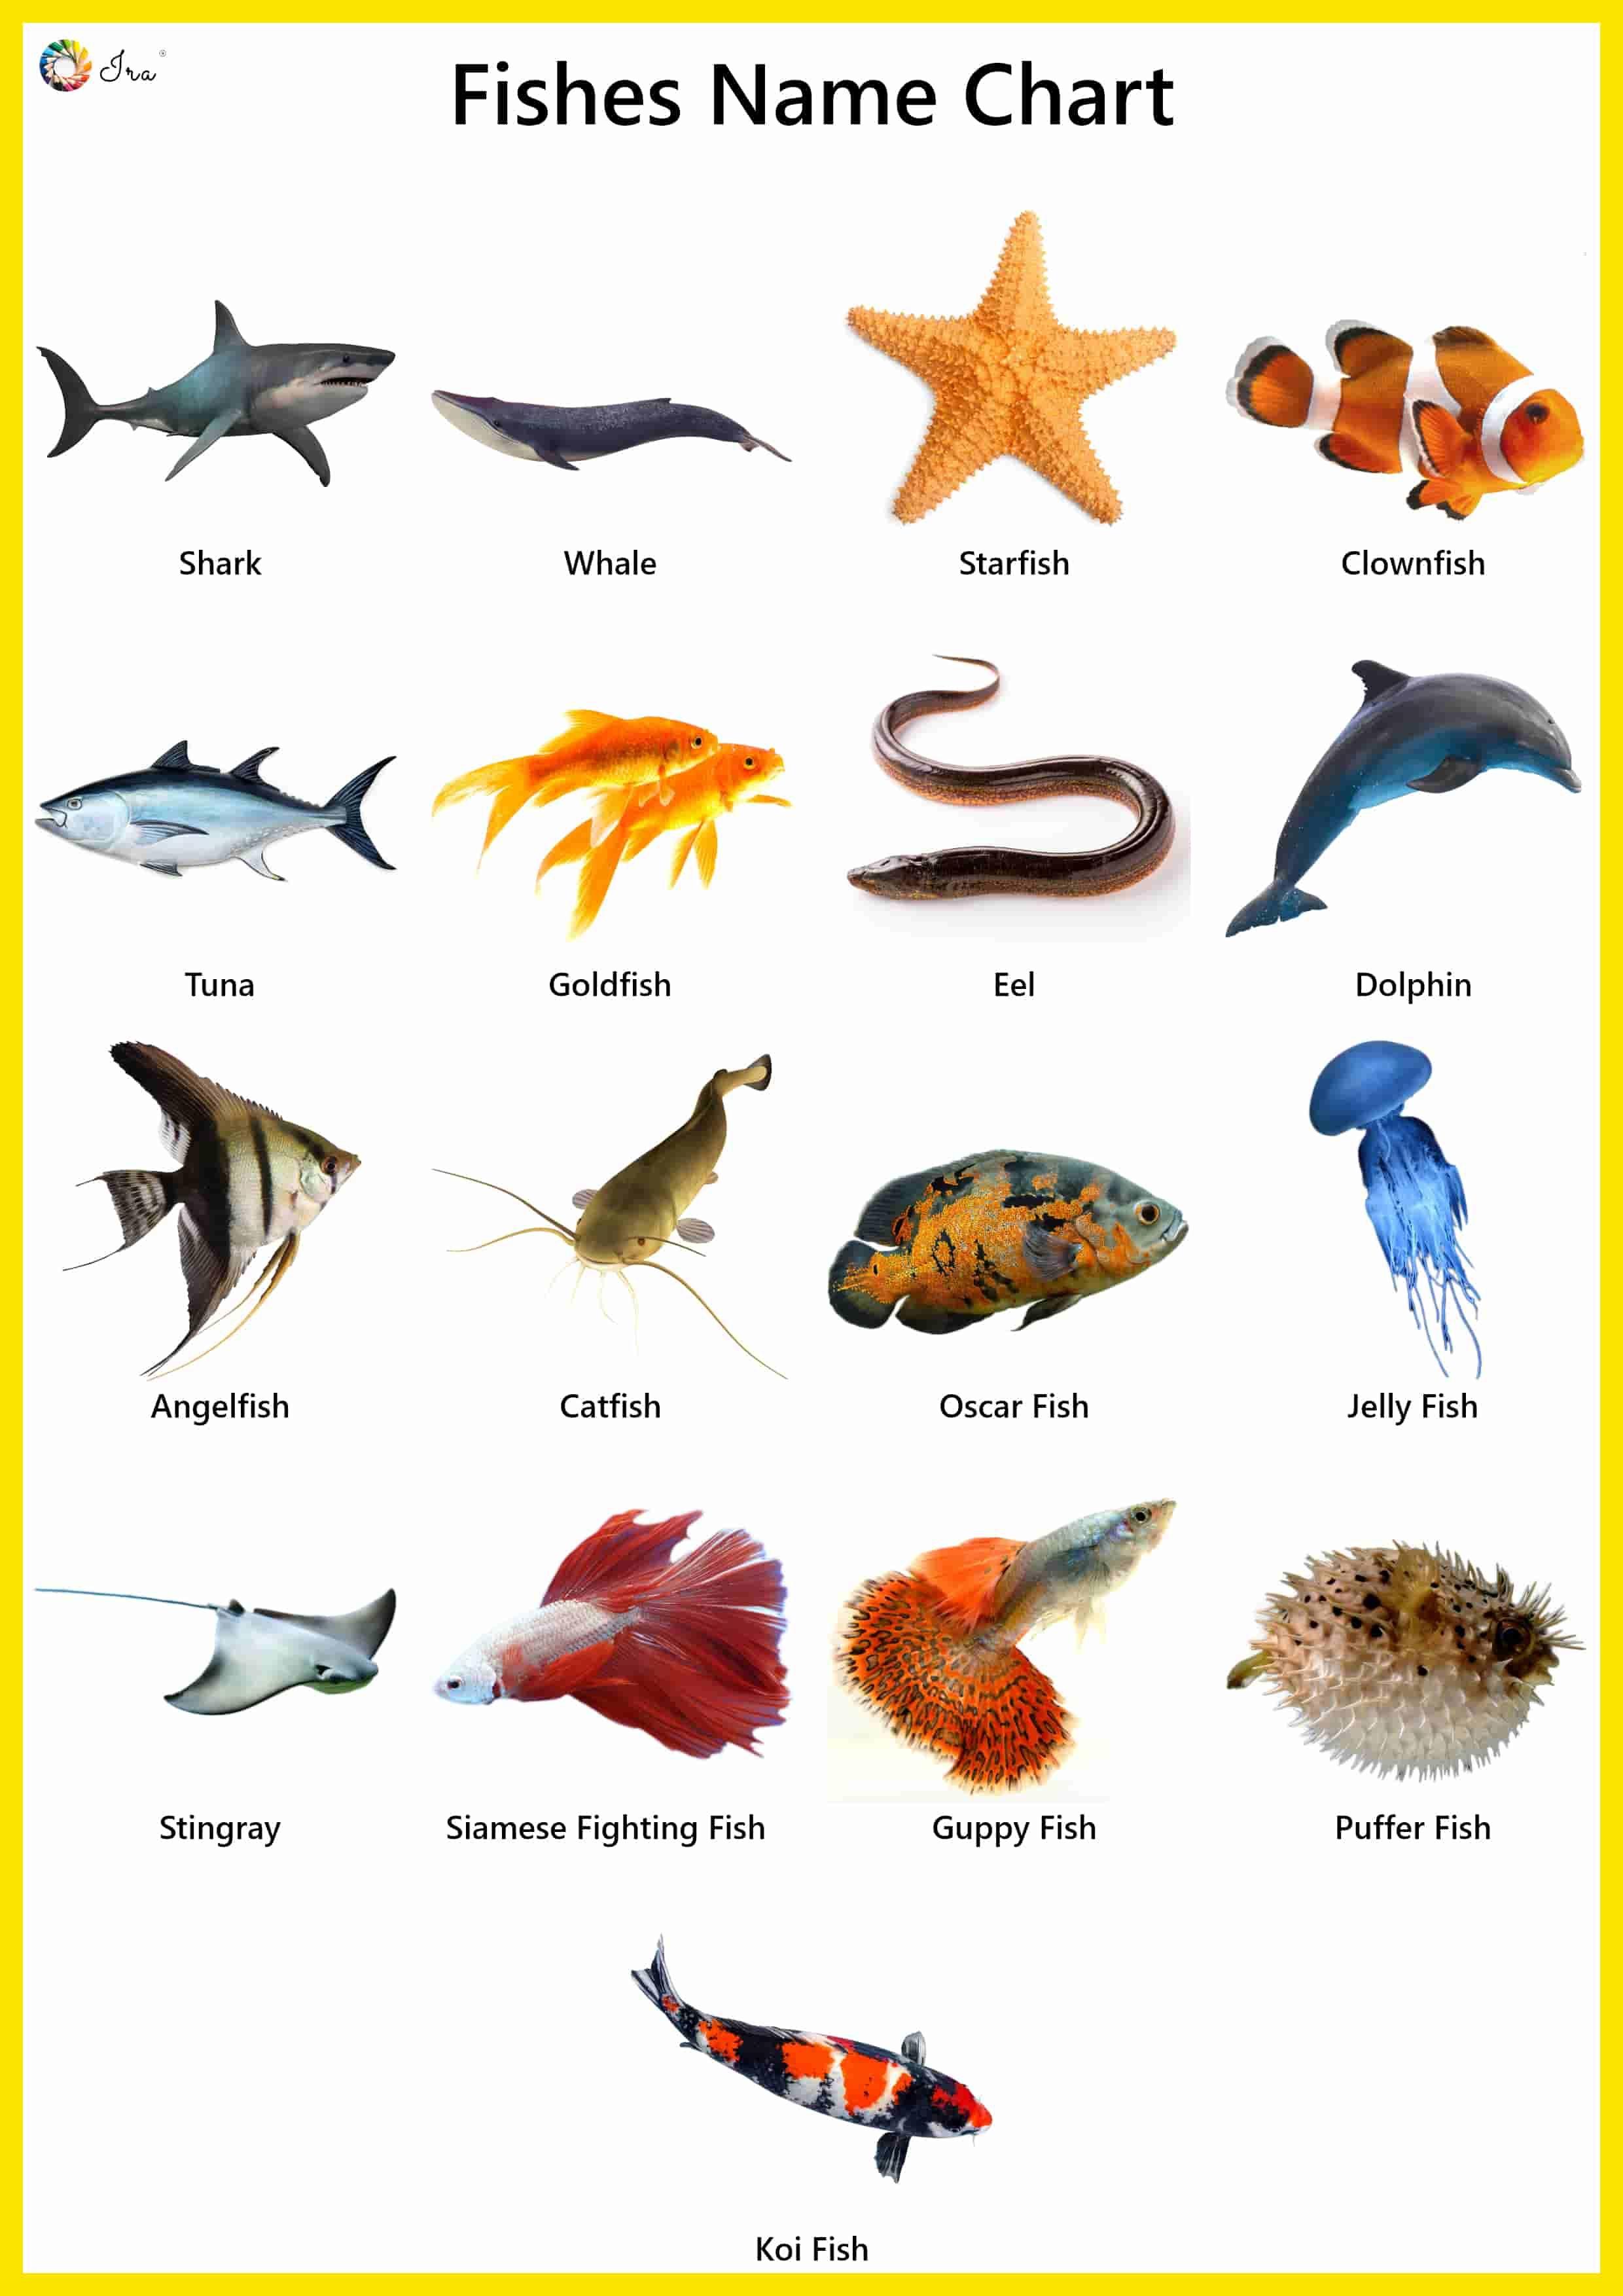 Fish Names Facts In 2020 Fish Chart Fish Coloring Page Fish